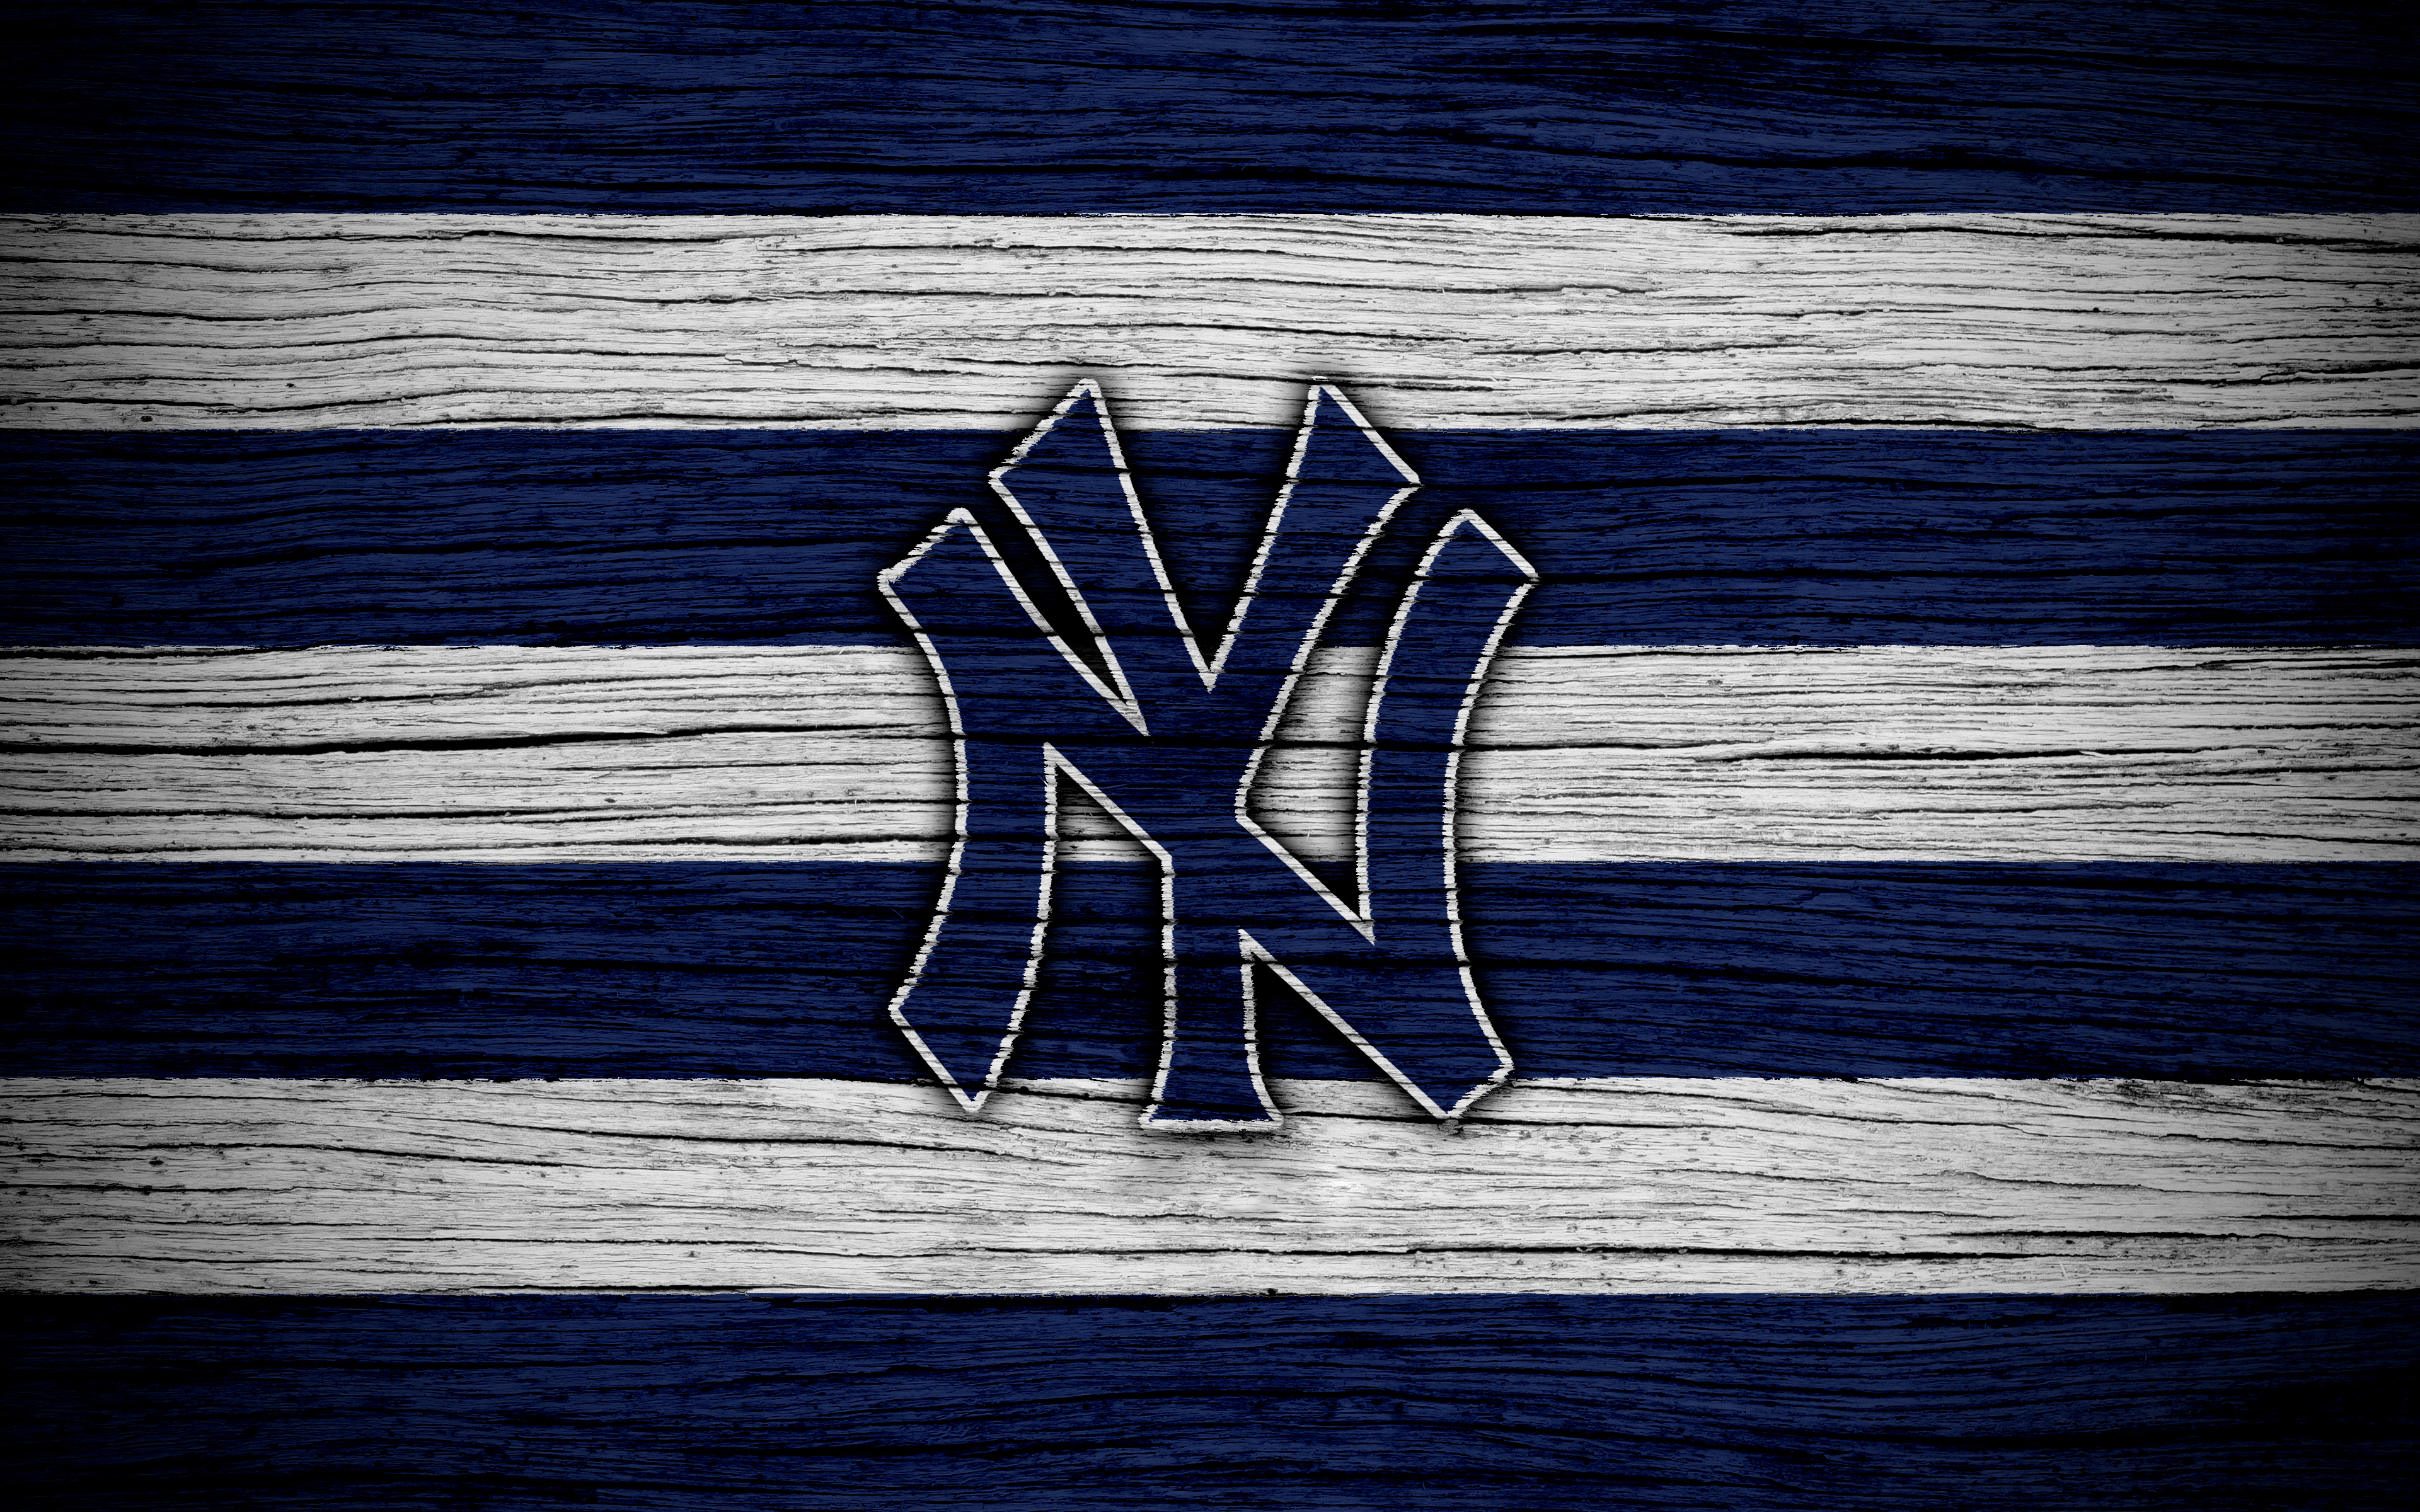 New York Yankees 4k Ultra HD Wallpaper | Background Image ...